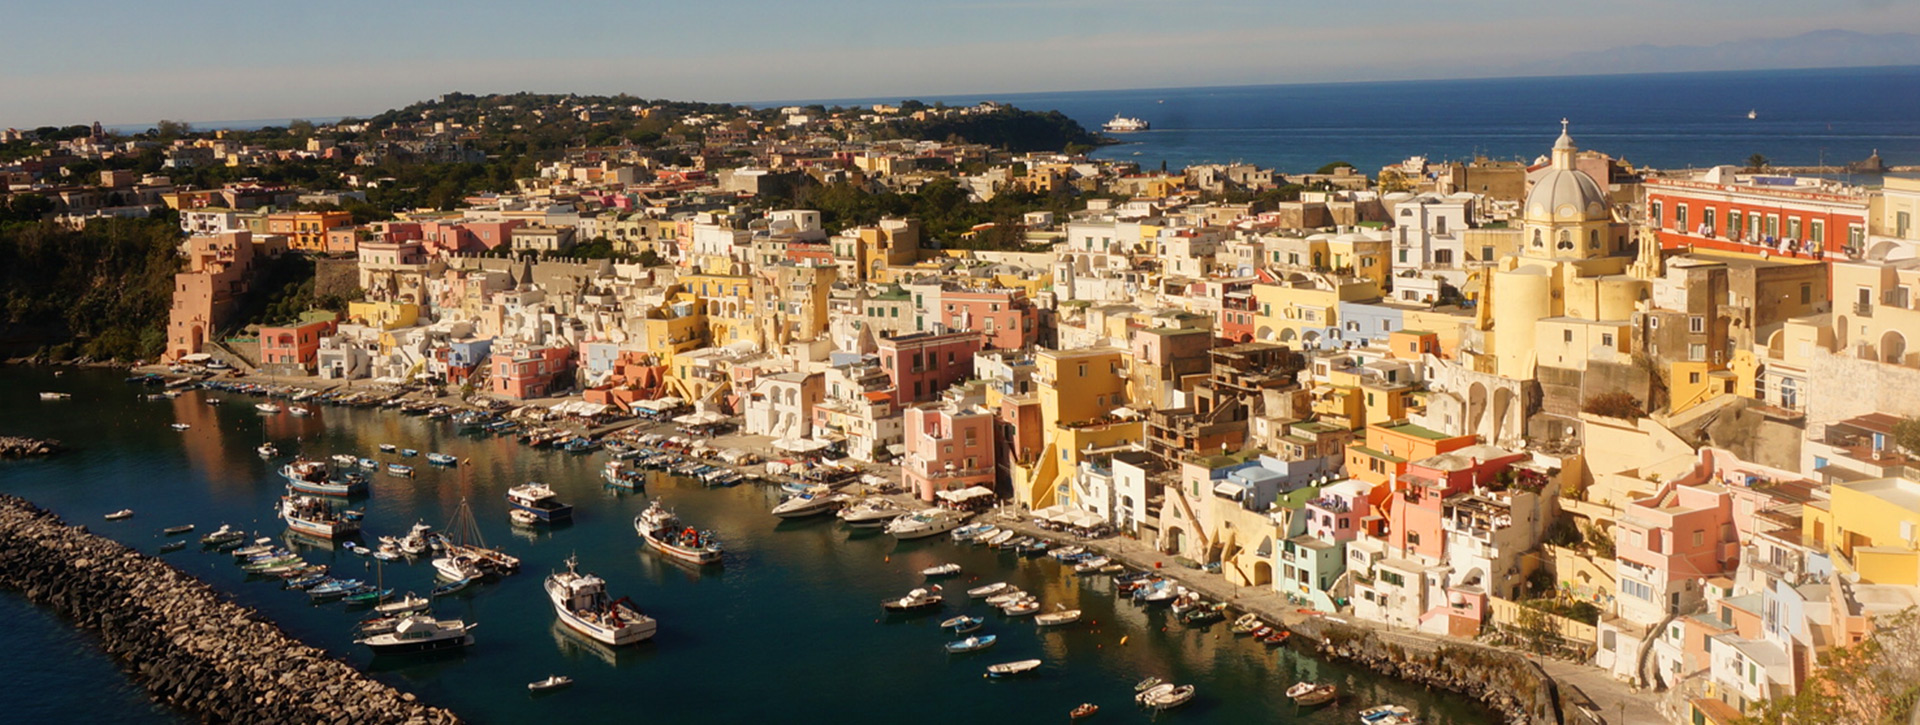 Day Trip To Procida, Italy